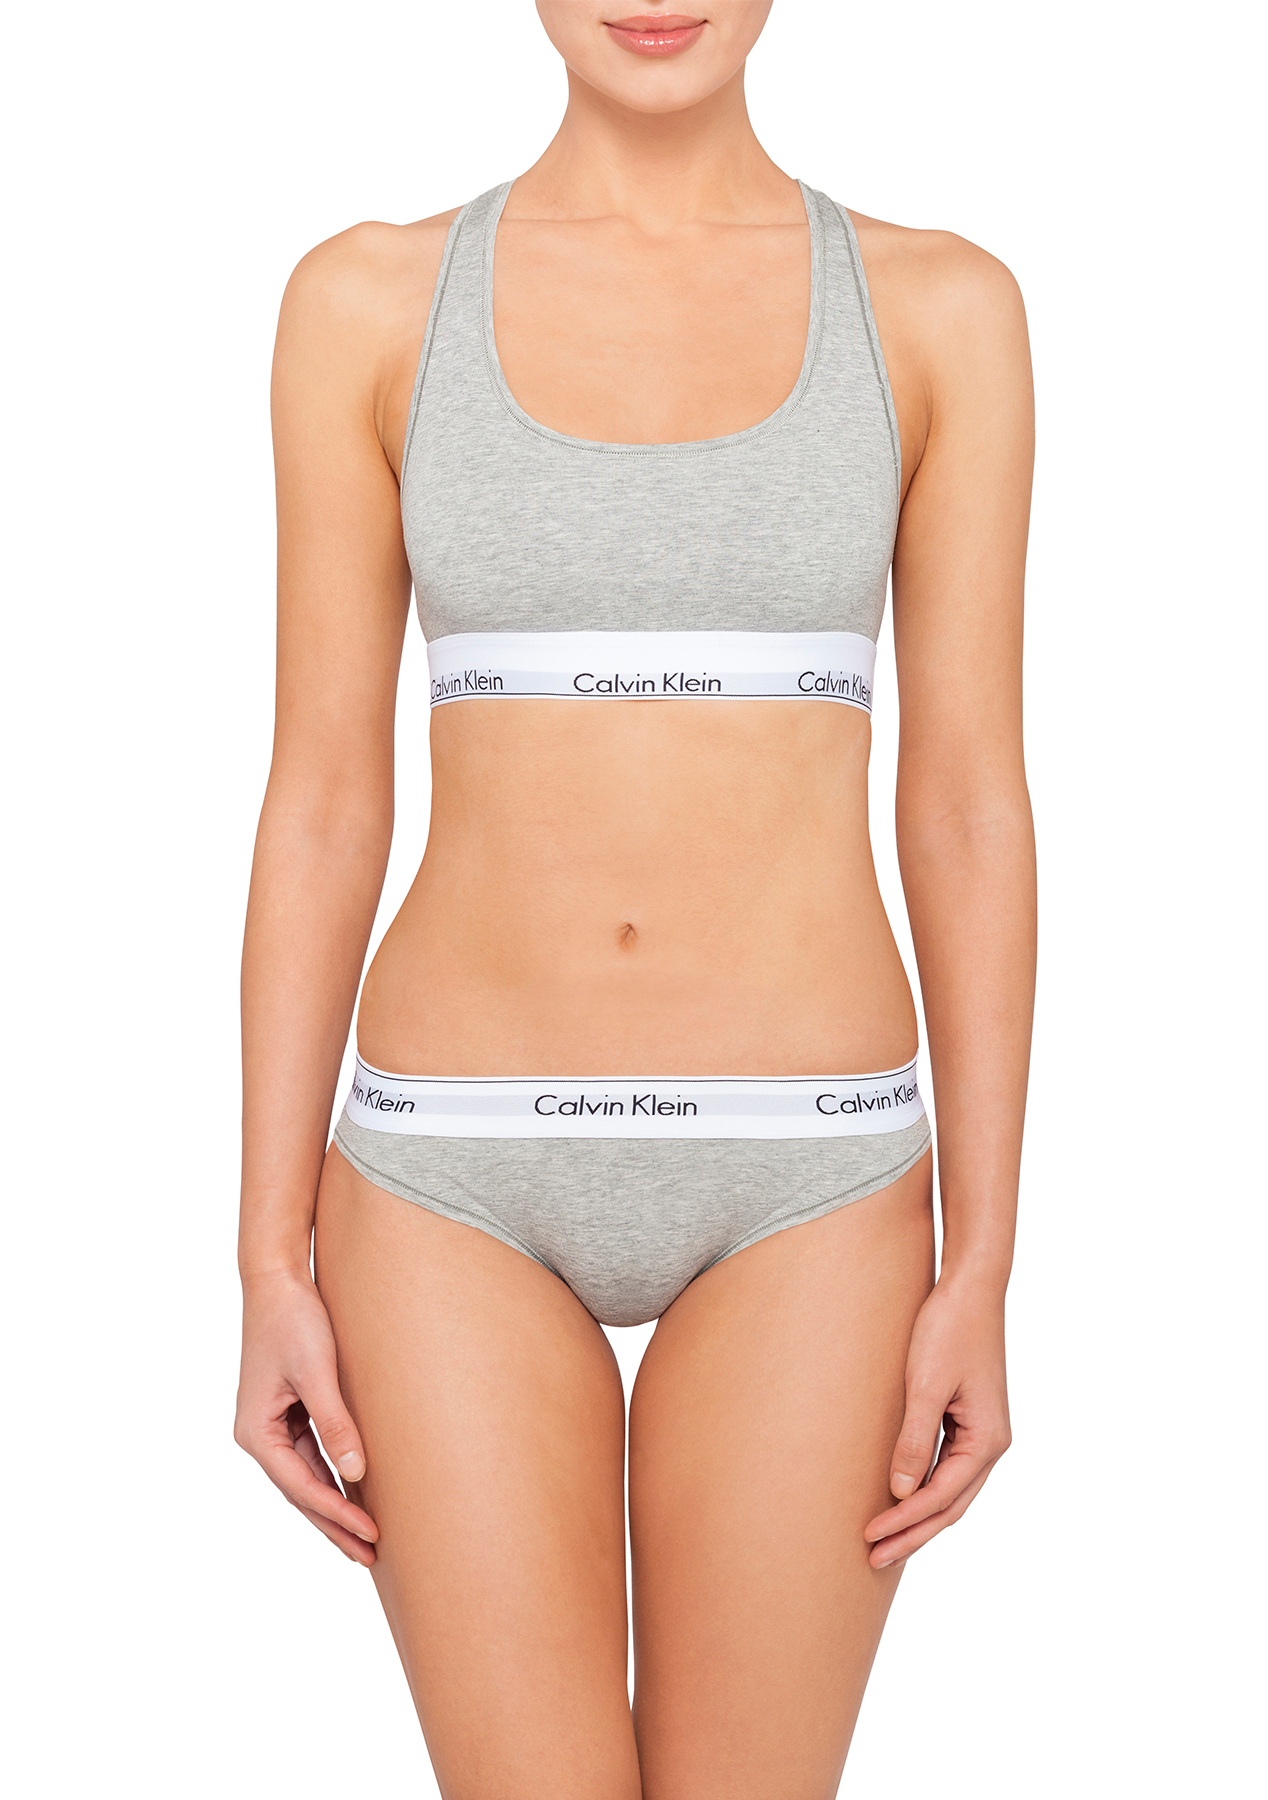 0610221683f8db calvin klein modern cotton bikini set sale   OFF52% Discounts